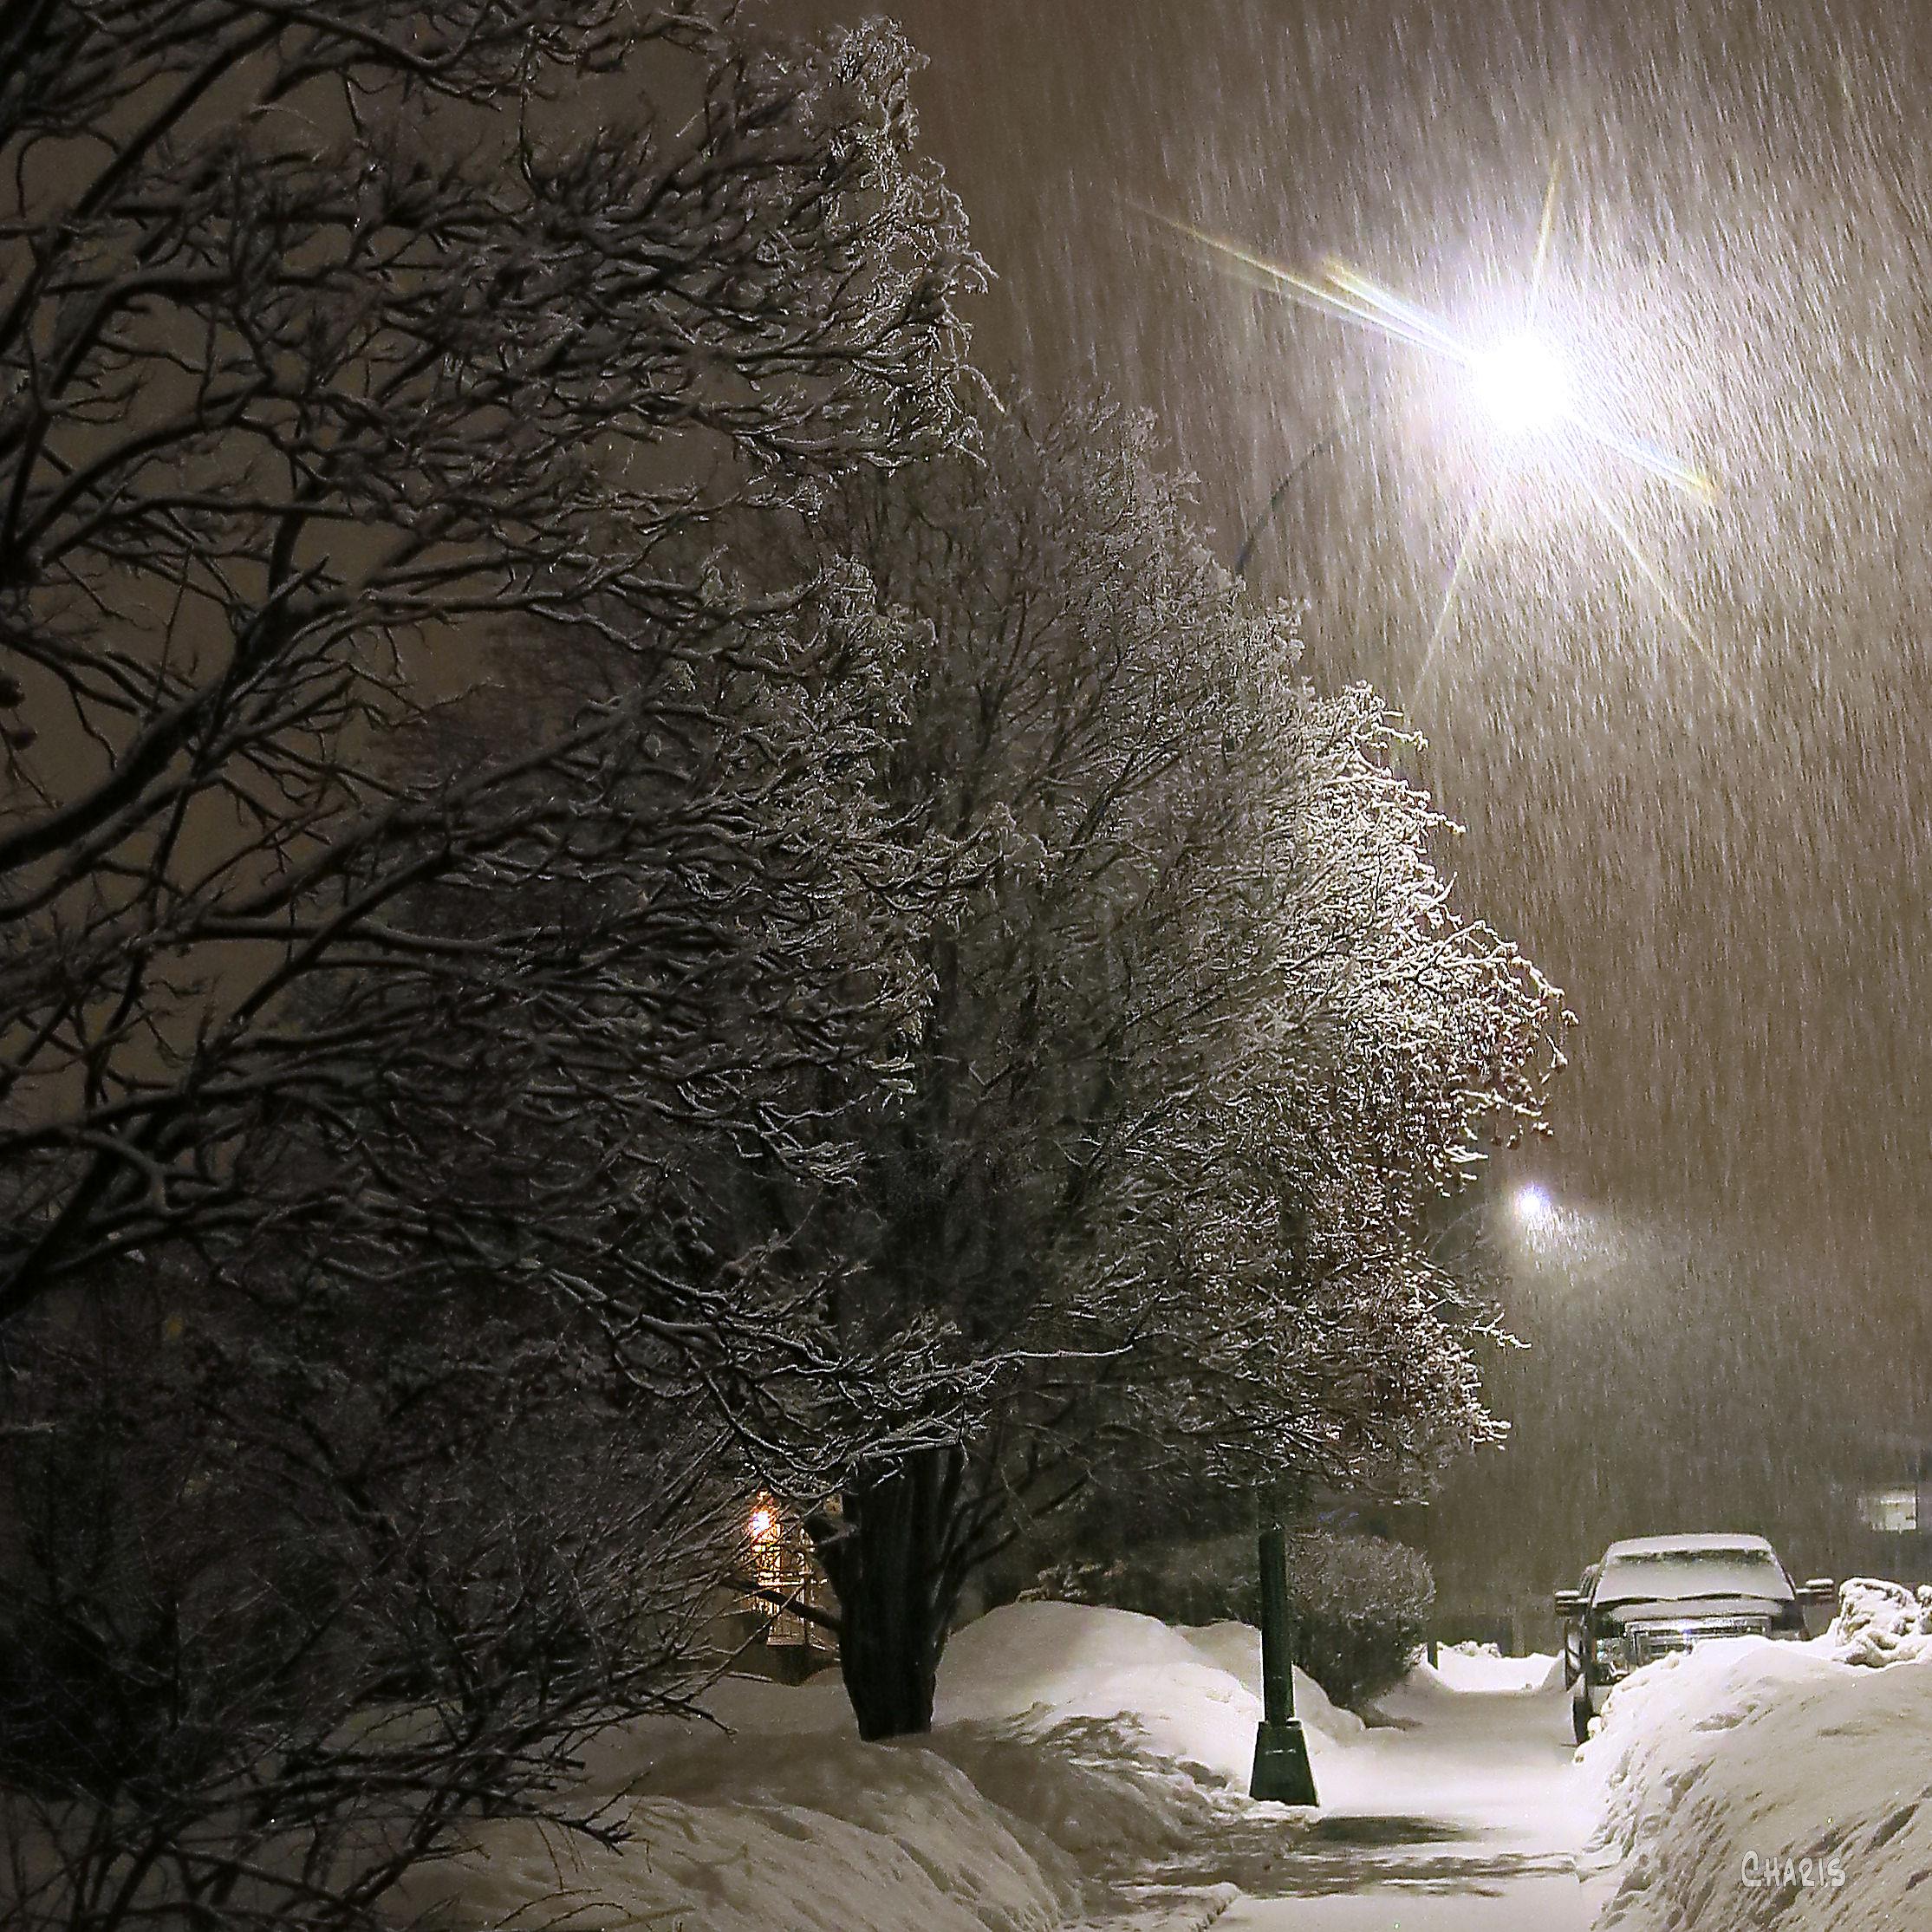 street-snow-winter-vertical-2-ch-img_6895